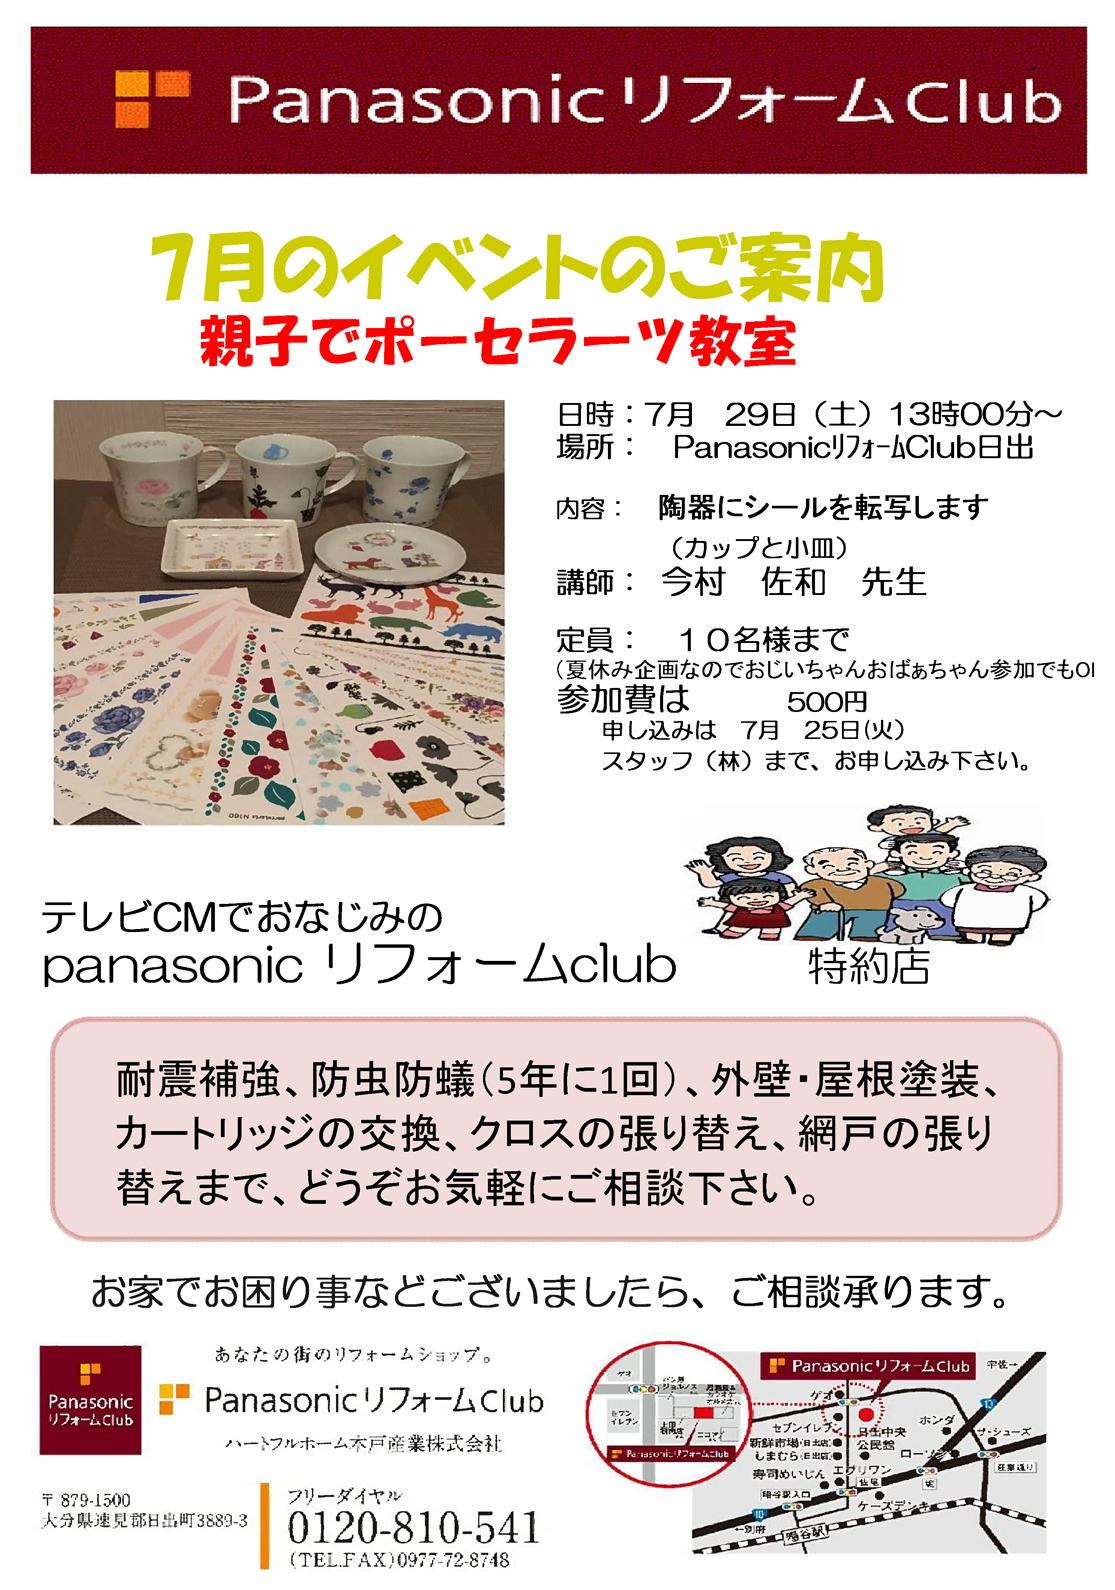 201707051707463a9.jpg